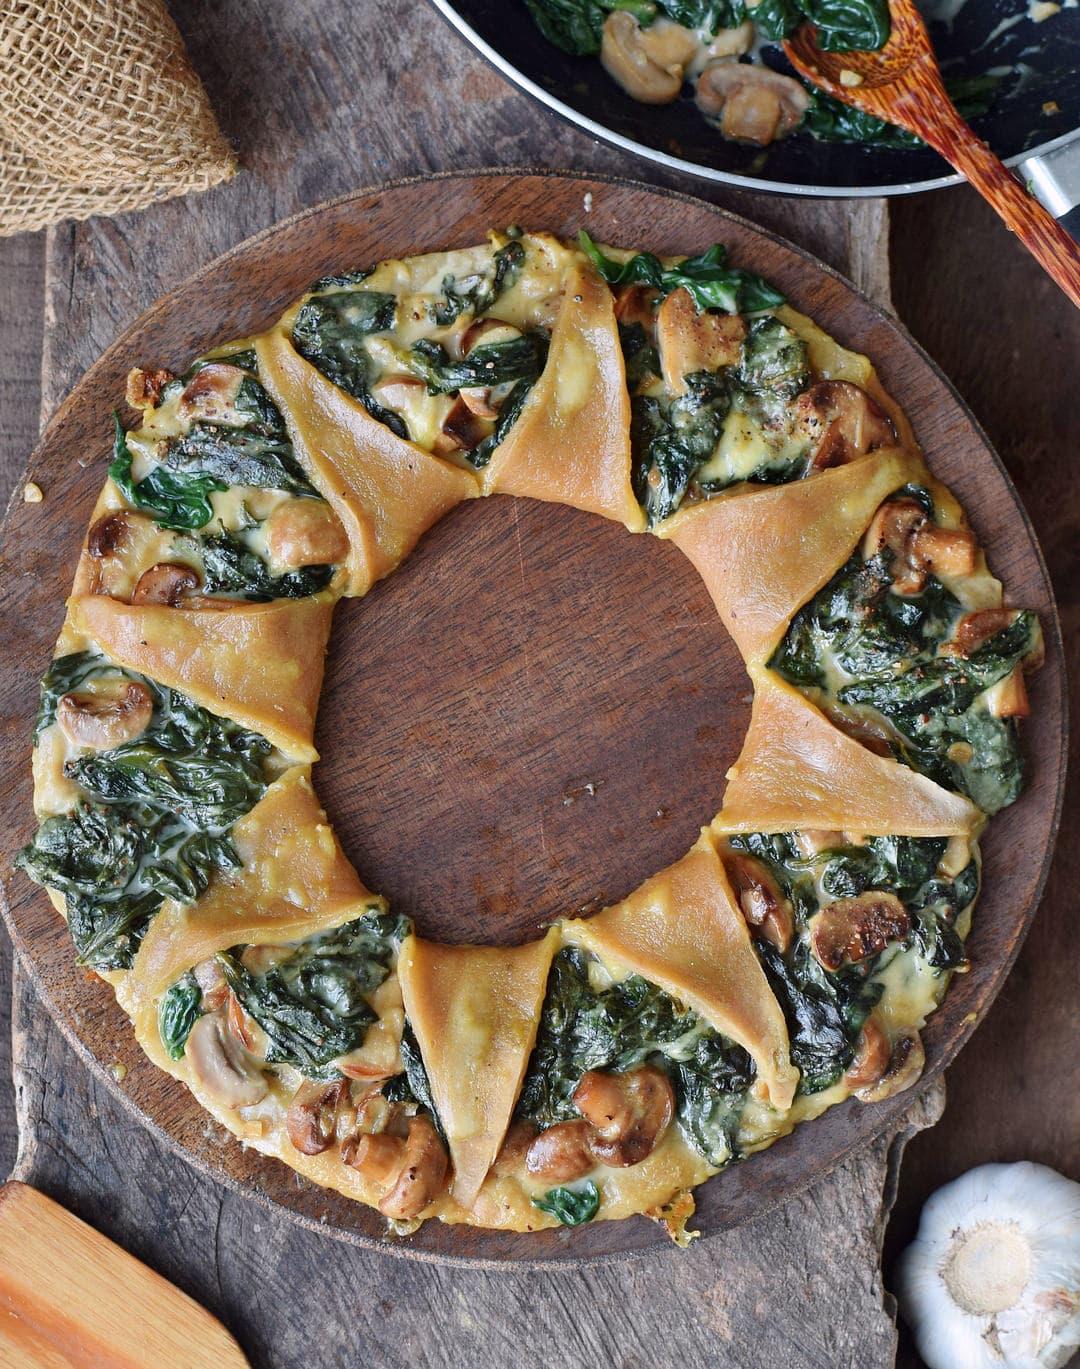 Pizzakranz (Pizza Corona) mit Spinat Pilzen und veganem Käse